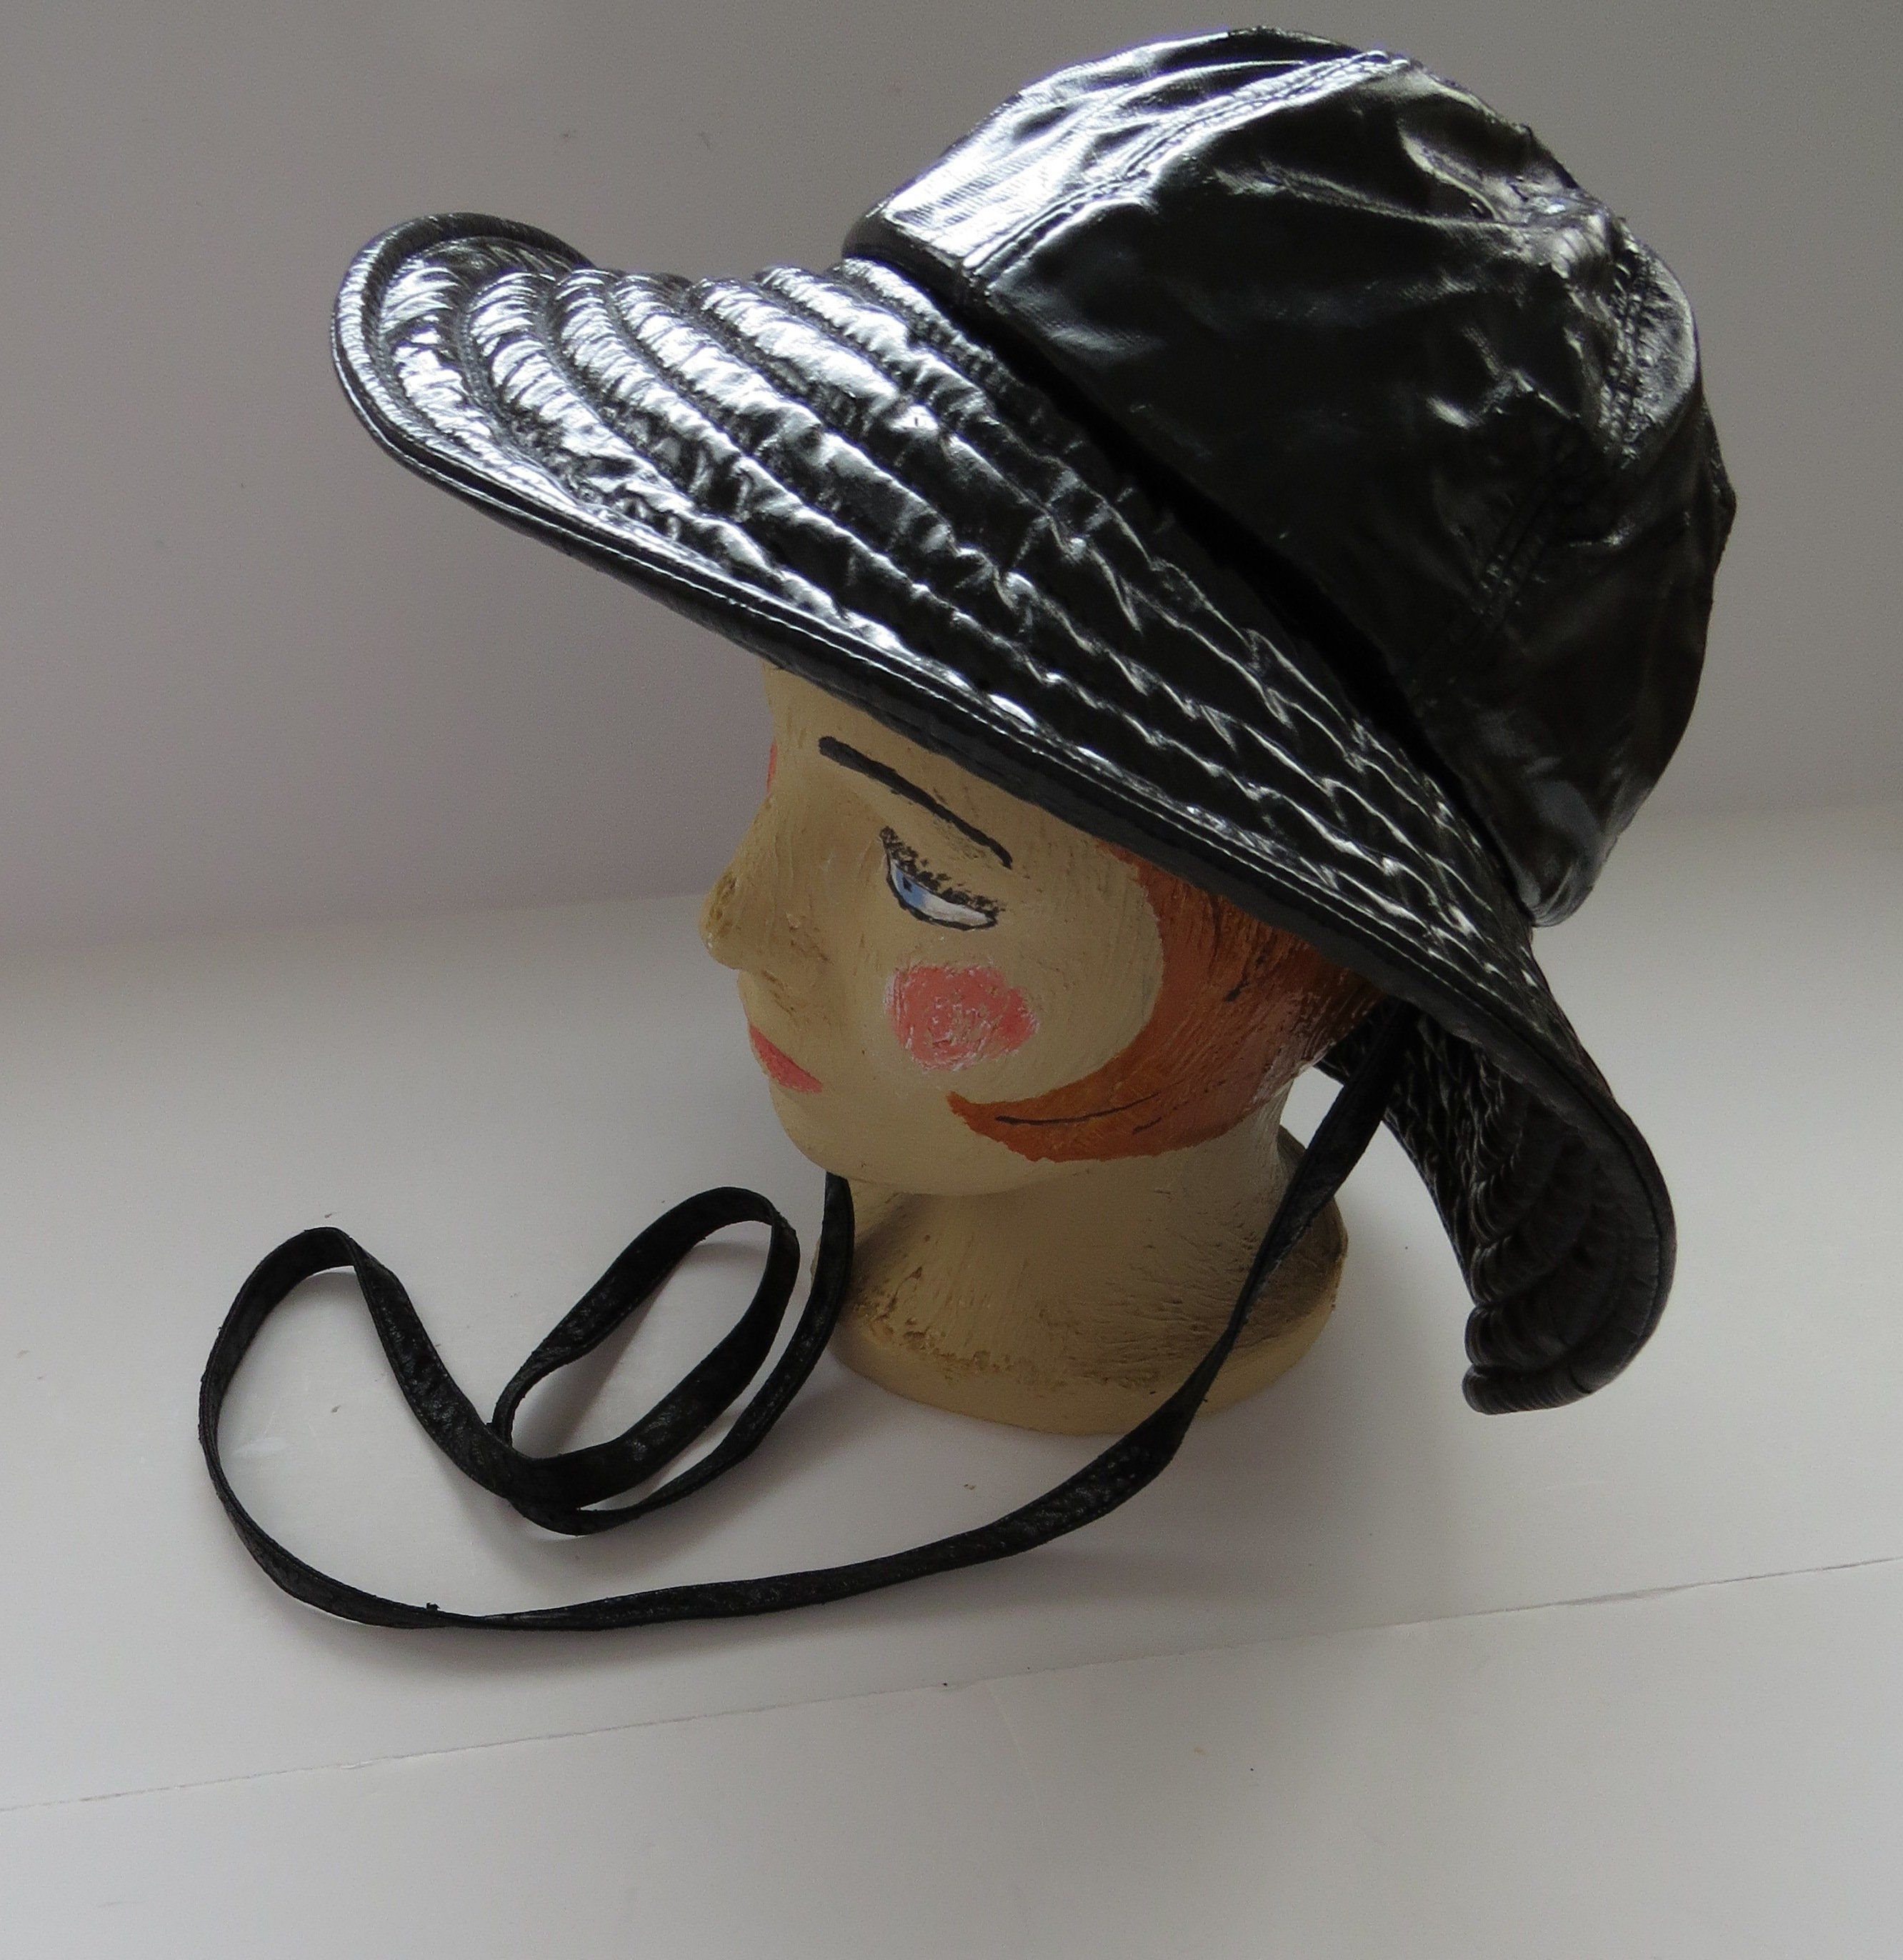 cd39de4afce140 1970s Black Vinyl Rain Hat by Totes - Retro Mod - Chic Stylish Rain Gear -  Wide Brim Bucket Hat - Vintage Womens Fashion Accessories